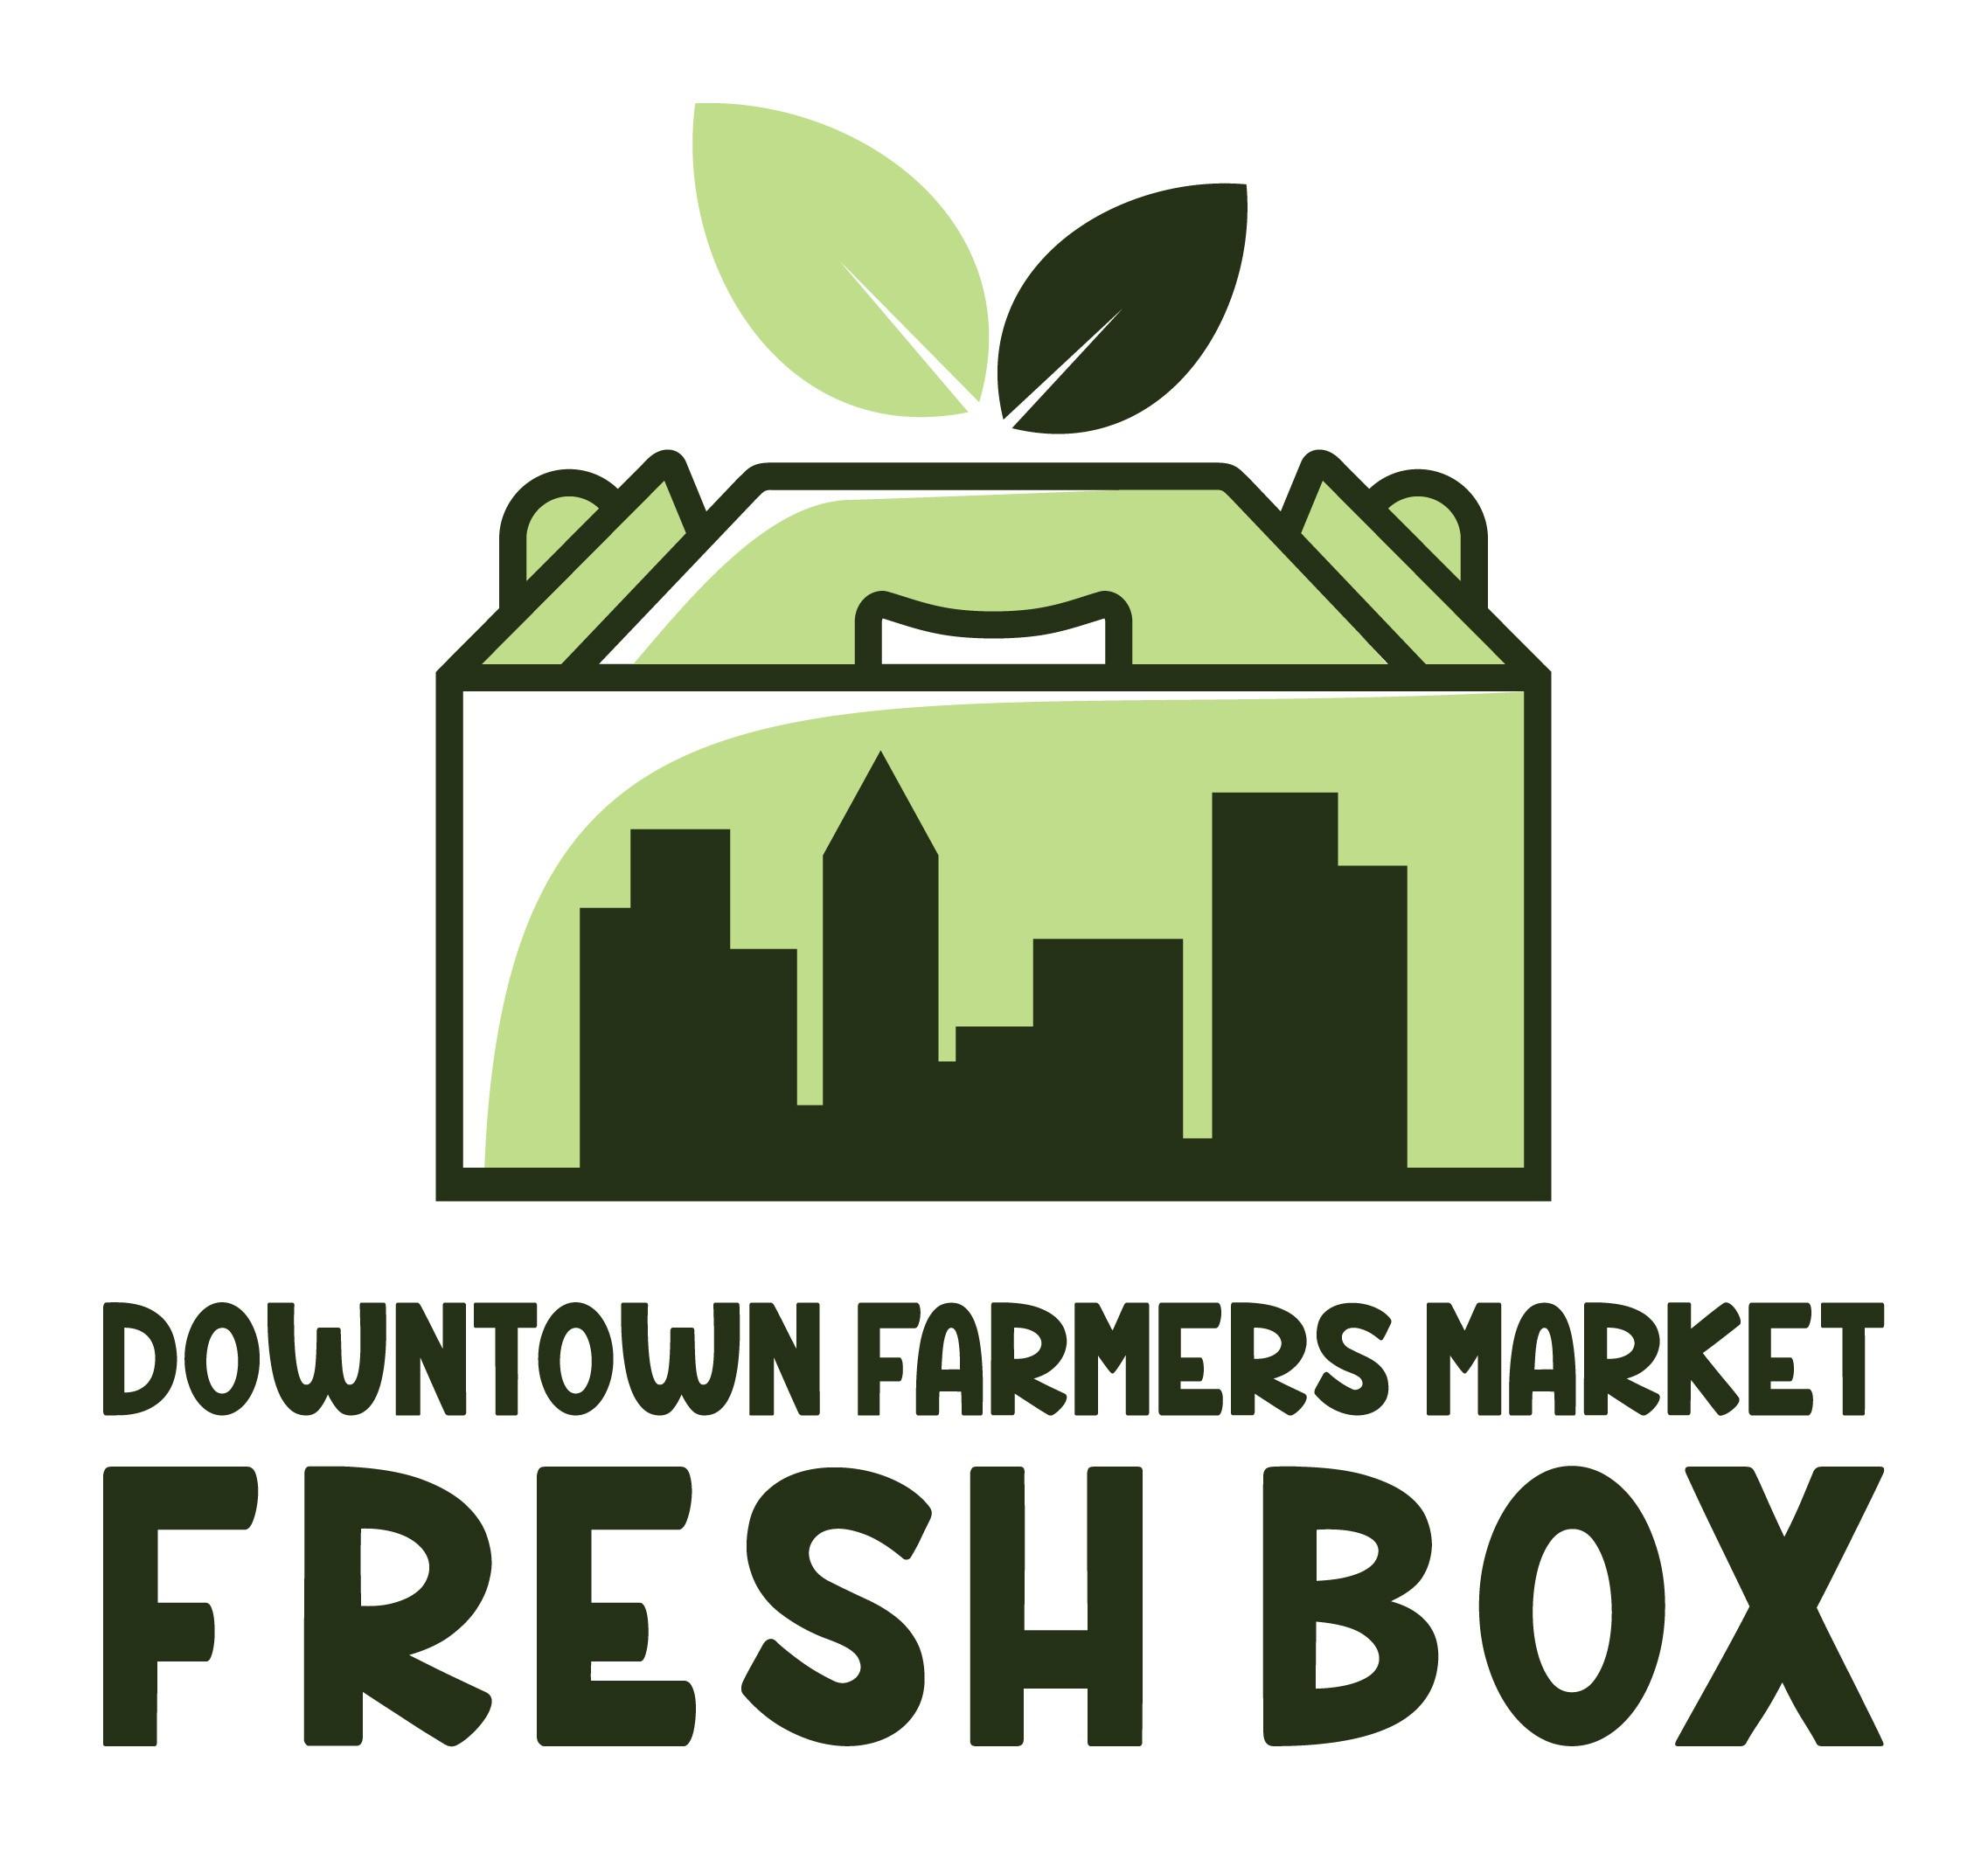 The Downtown Market Fresh Box needs a fun, fresh logo!